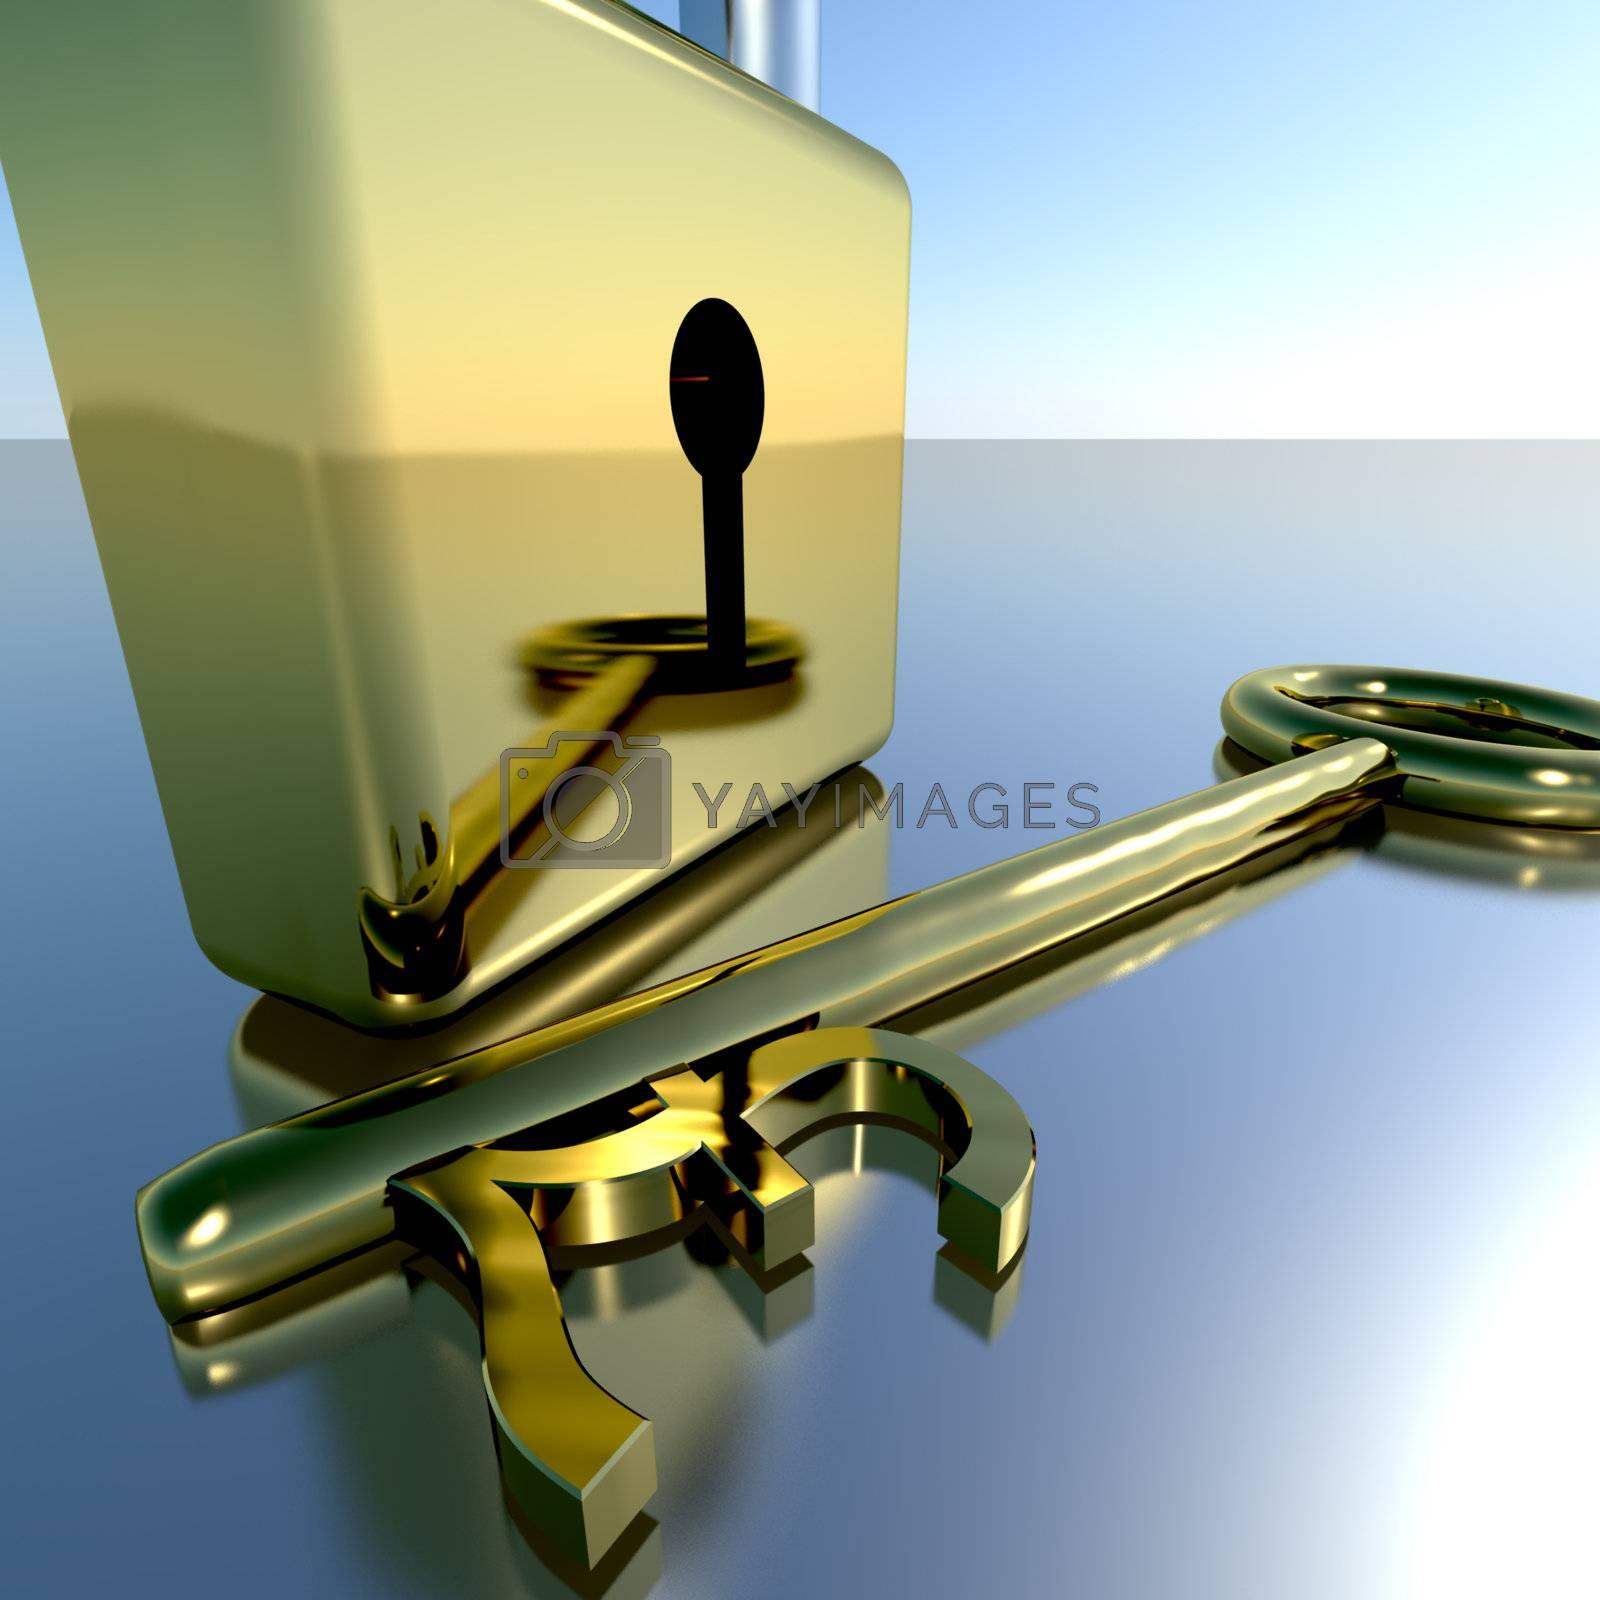 Pound Key With Padlock Showing Banking Savings And Finances